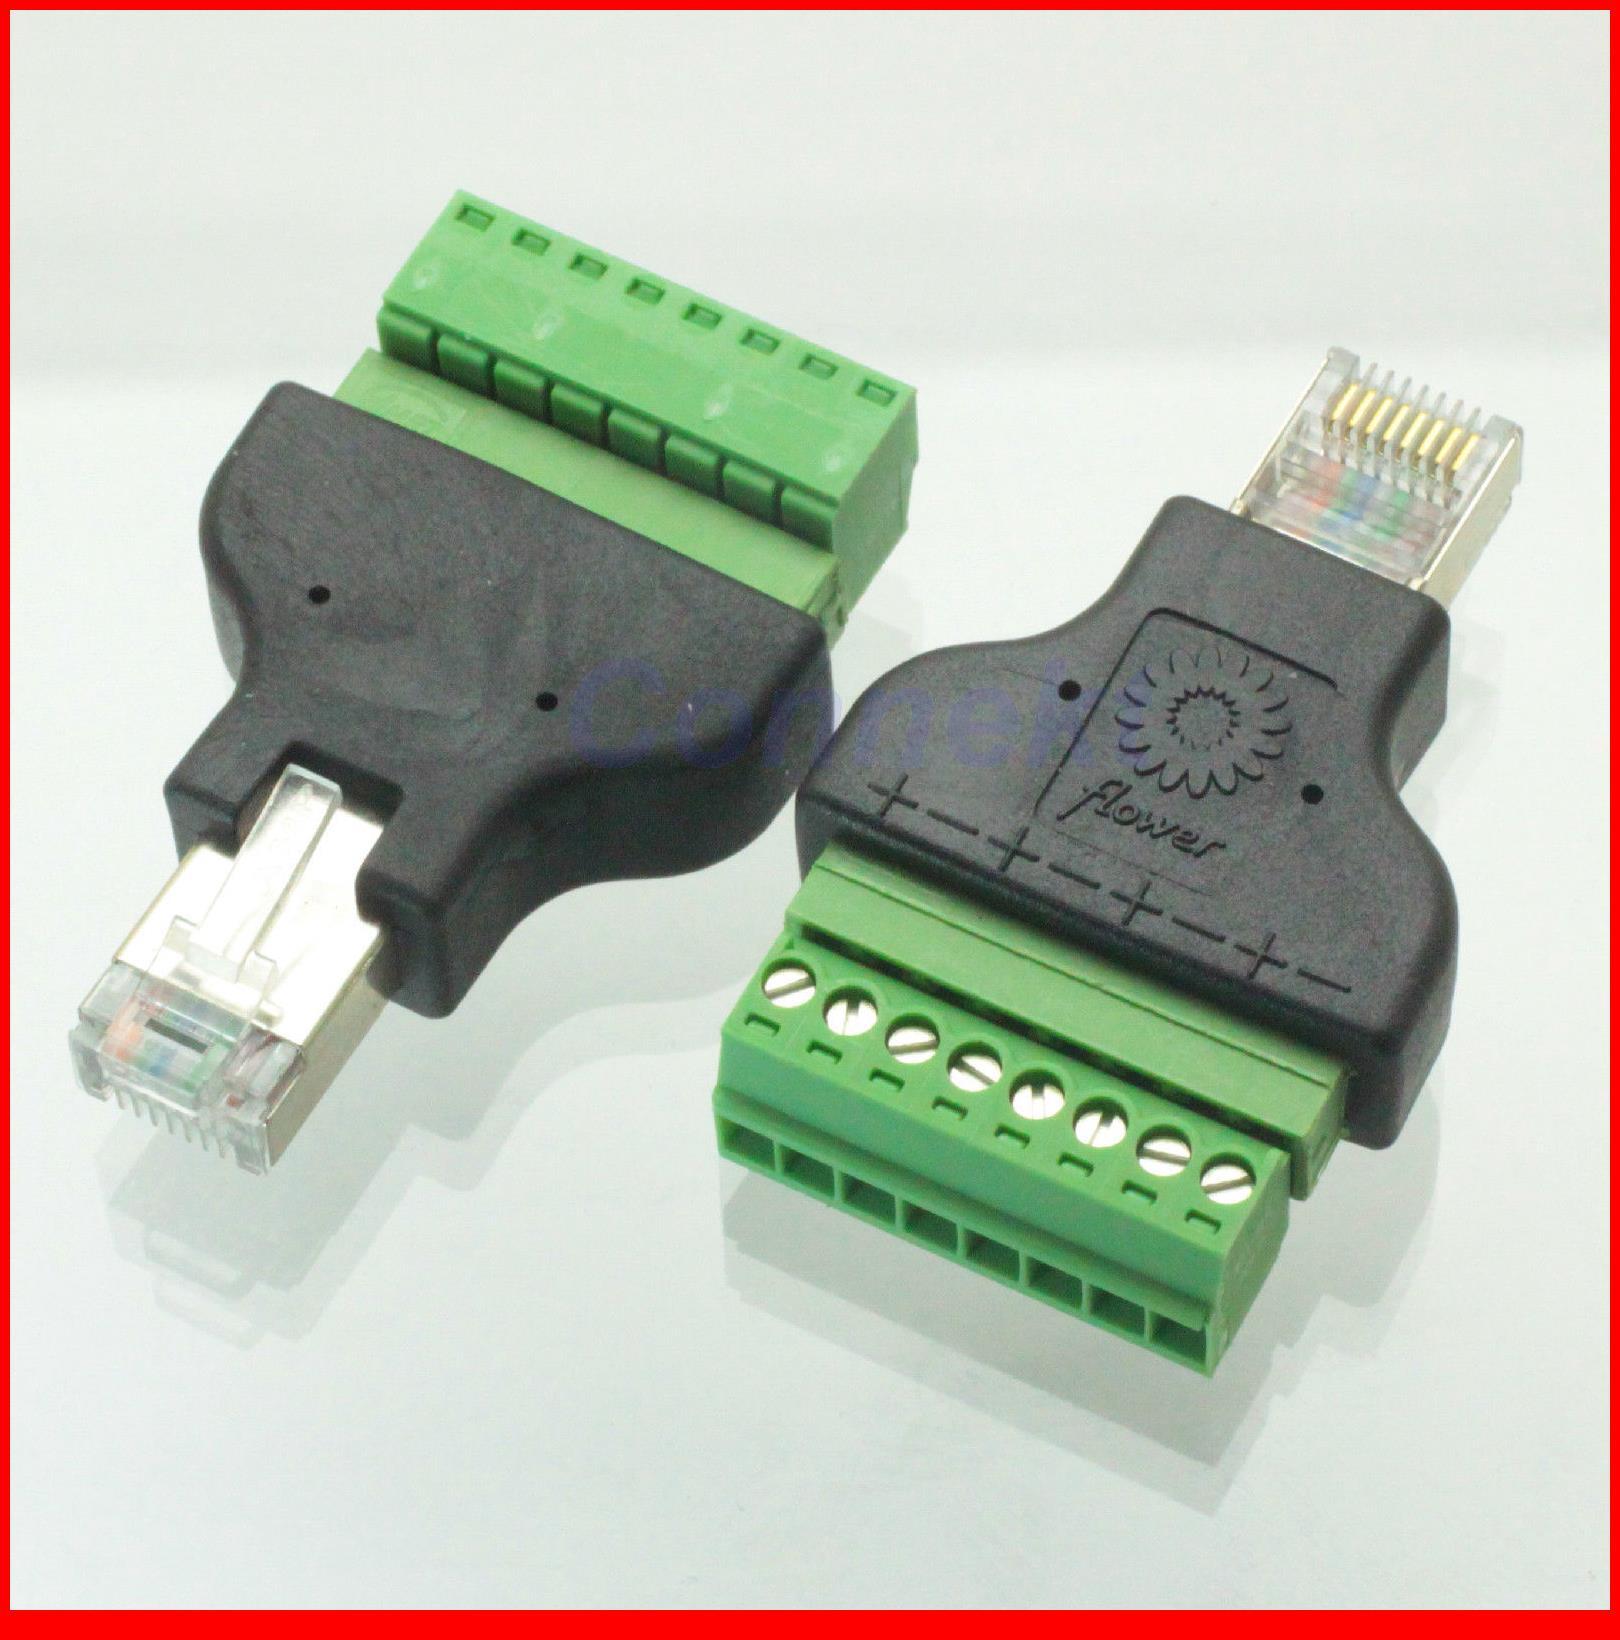 10pcs/lot Ethernet 8P8C RJ45 male plug to AV Terminal Connector Adapter CCTV Radio usb 2 0 to rj45 lan ethernet network adapter